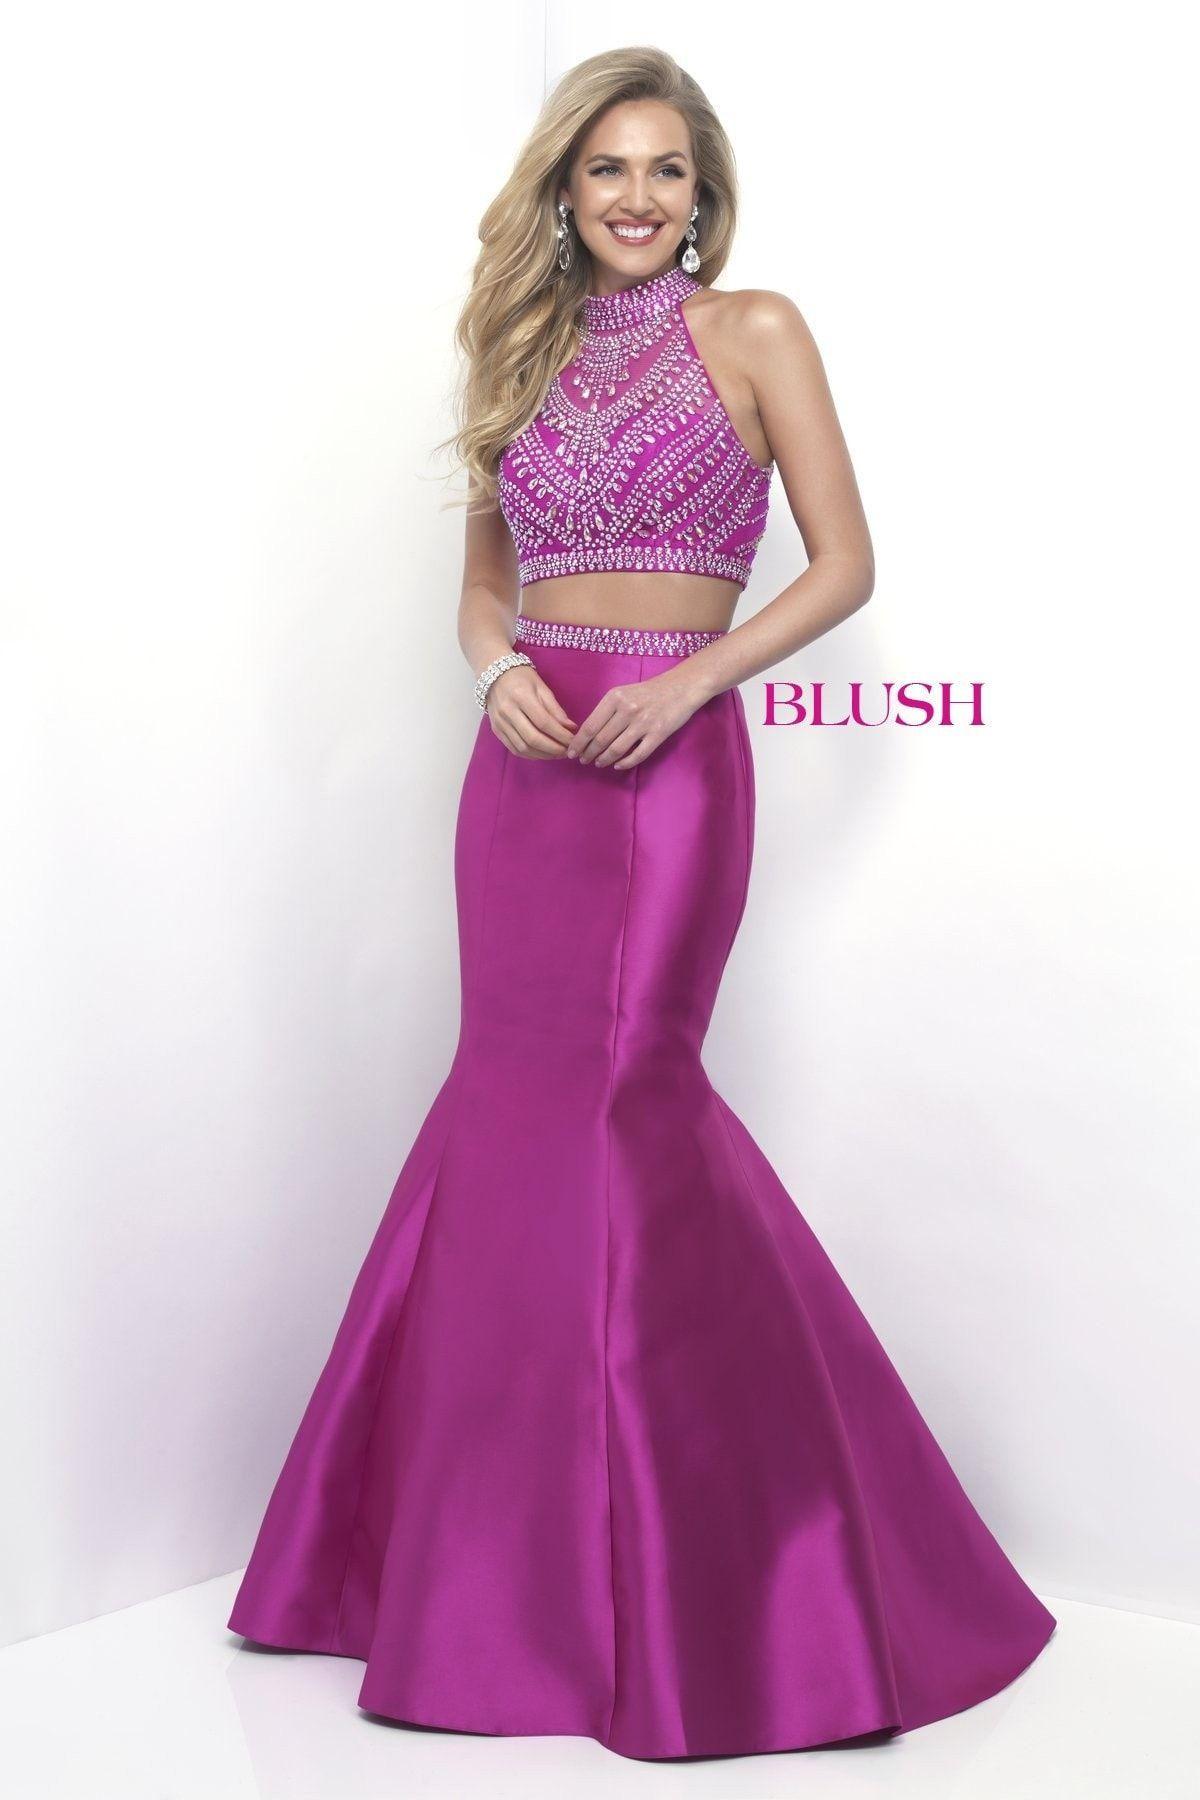 Blush Prom 11268 Magenta Halter Mikado Mermaid Prom Dress | Products ...